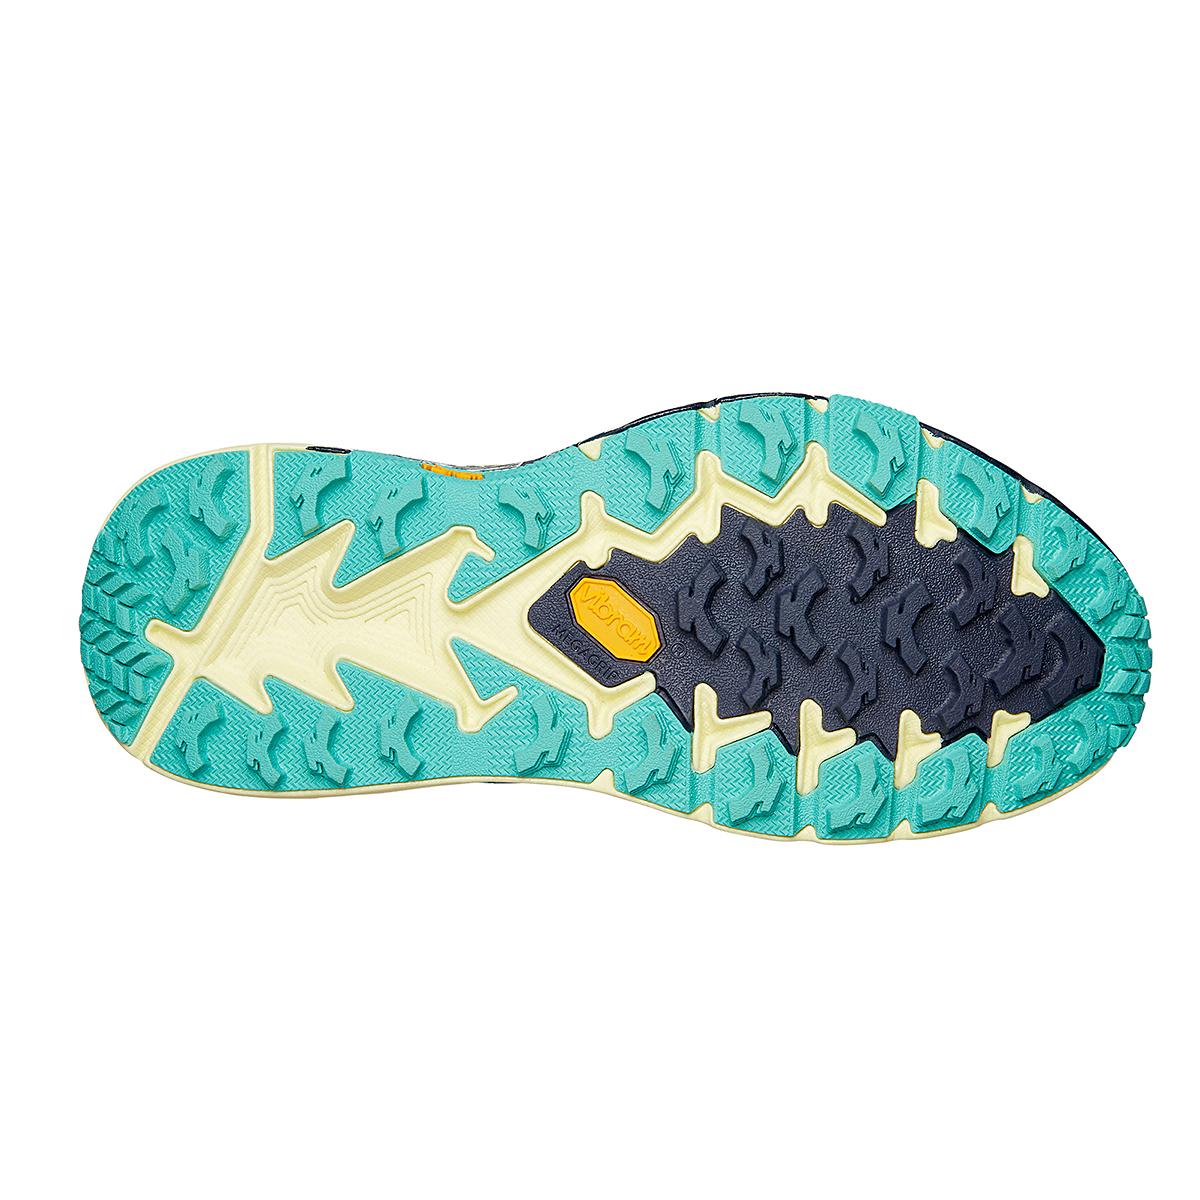 Women's Hoka One One Speedgoat 4 Running Shoe - Color: Provincial Blue/Luminary Green - Size: 5 - Width: Regular, Provincial Blue/Luminary Green, large, image 4